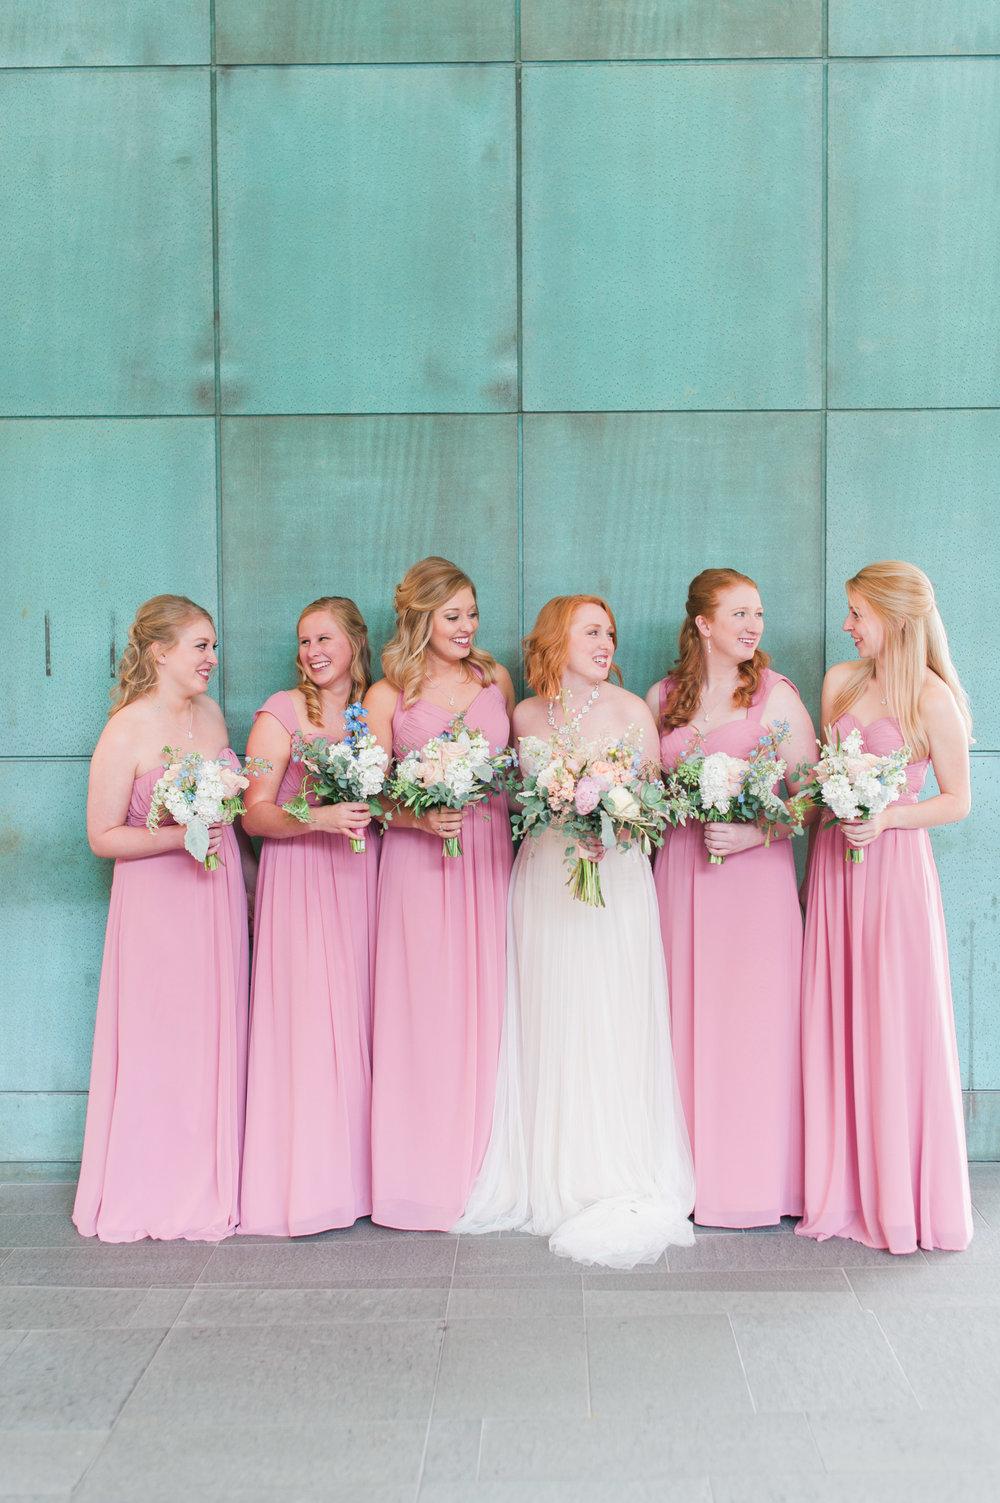 omaha-holland-arts-center-wedding-56.jpg